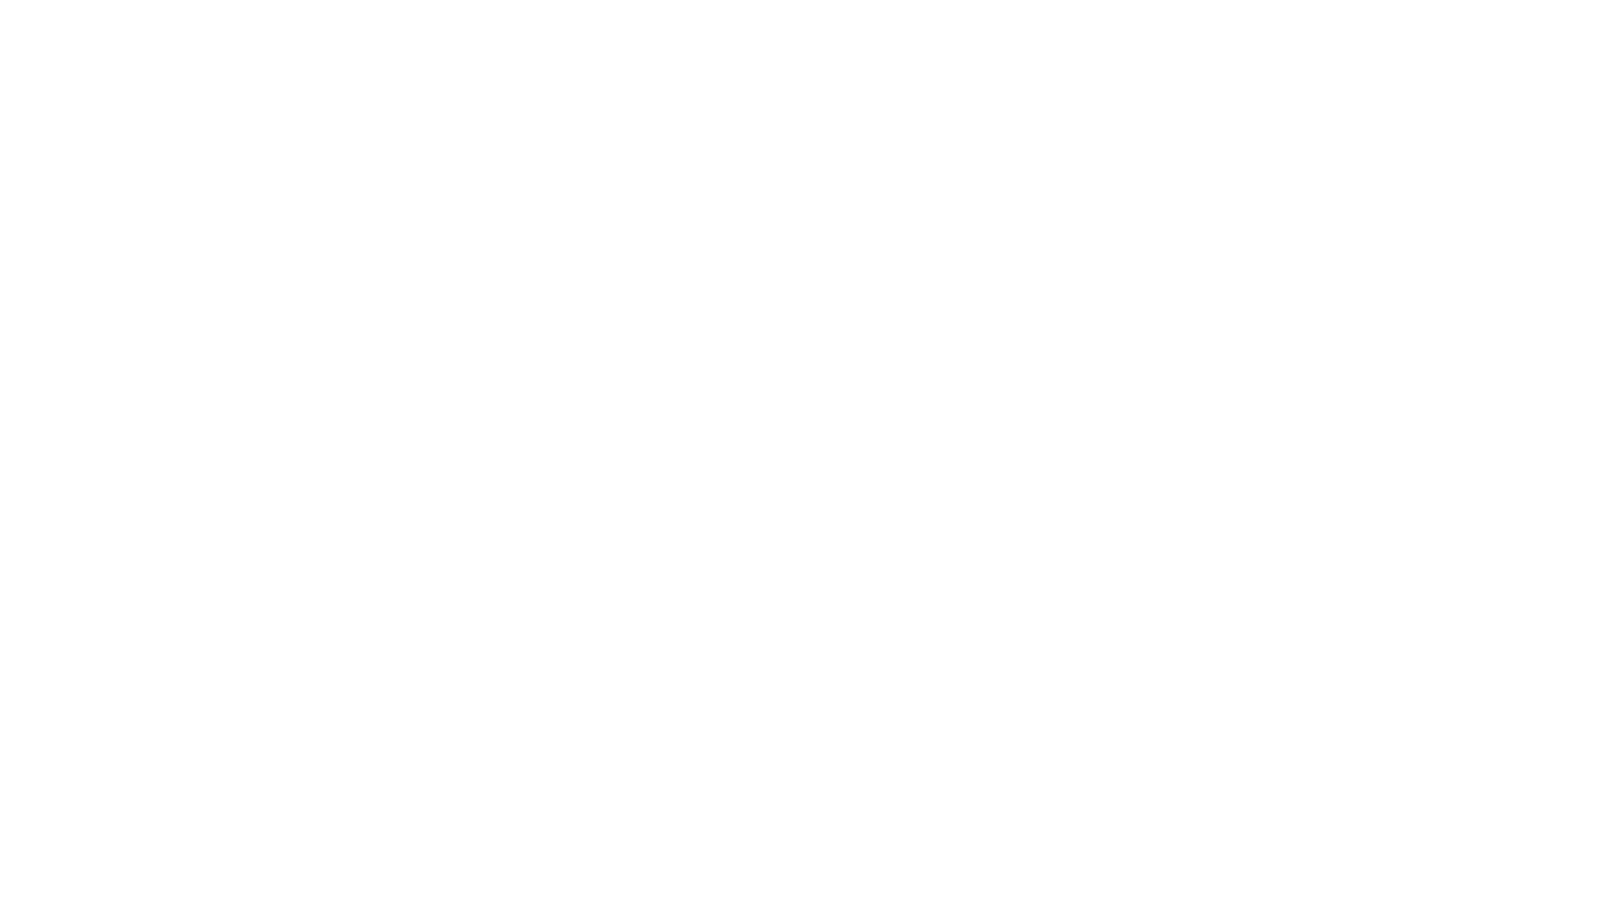 Perfomed By Students Intensive acting Batch | August 2021.   Cinematographer, Choreography,  Editing, Direction - D. Ganesha Produced By - Shobha C.S. Assistant Choreography - Sathya M.S. Assistant Cinematography - Praveen H.M. Camera Team - Puneeth, Suresh.  Cast: Dada Peer, Arun Kumar V, Annapurna N, Geethapriya, Girish P, Godasi Sai Sumith,  Gurubalaji H, Harsha Hanni, Karthik M, Kiran K.B, Latha B, Mala C, Niranjan Swamy A U,  Poorvi U R S,    Raj,  Raghu K C, Shalini D, Shridharanaganoor, Sneha J, Shruthi M,   Tejaswini Prasad B R, Madan, Kiran.    Tent Cinema : Intensive Acting Students Dance Performance Video Song credits : Yuvarathnaa  Song: Oorigobba Raaja Special Thanks to Yuvarathnaa Team Divo Music  Credits  https://www.youtube.com/watch?v=JFfEI... Thank You : https://www.youtube.com/channel/UCarJ...